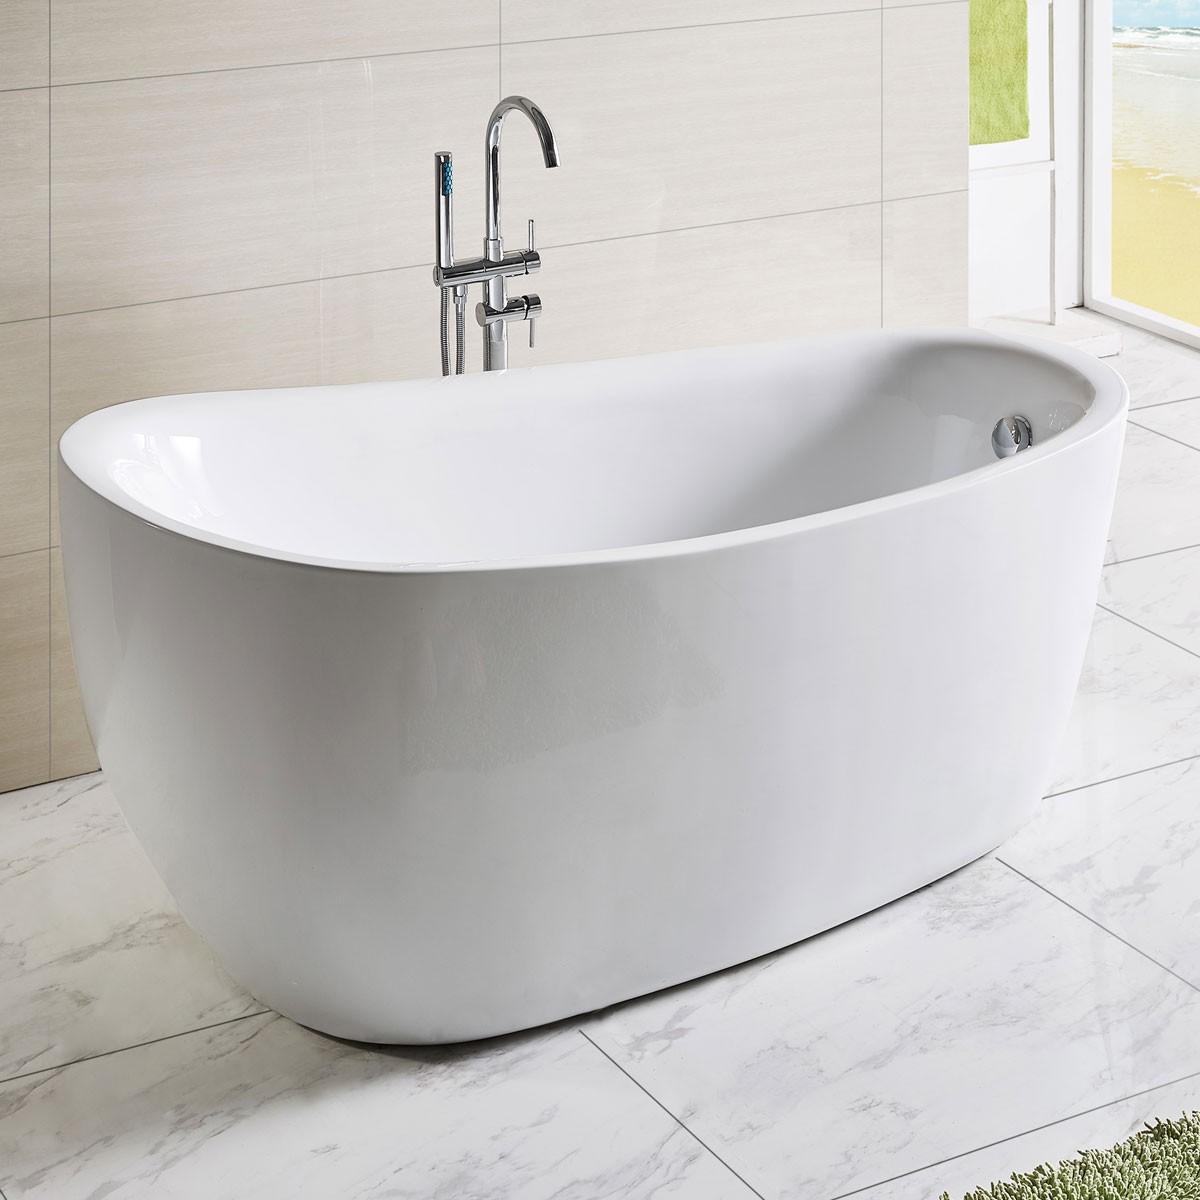 67 In White Acrylic Freestanding Bathtub Dk Q168